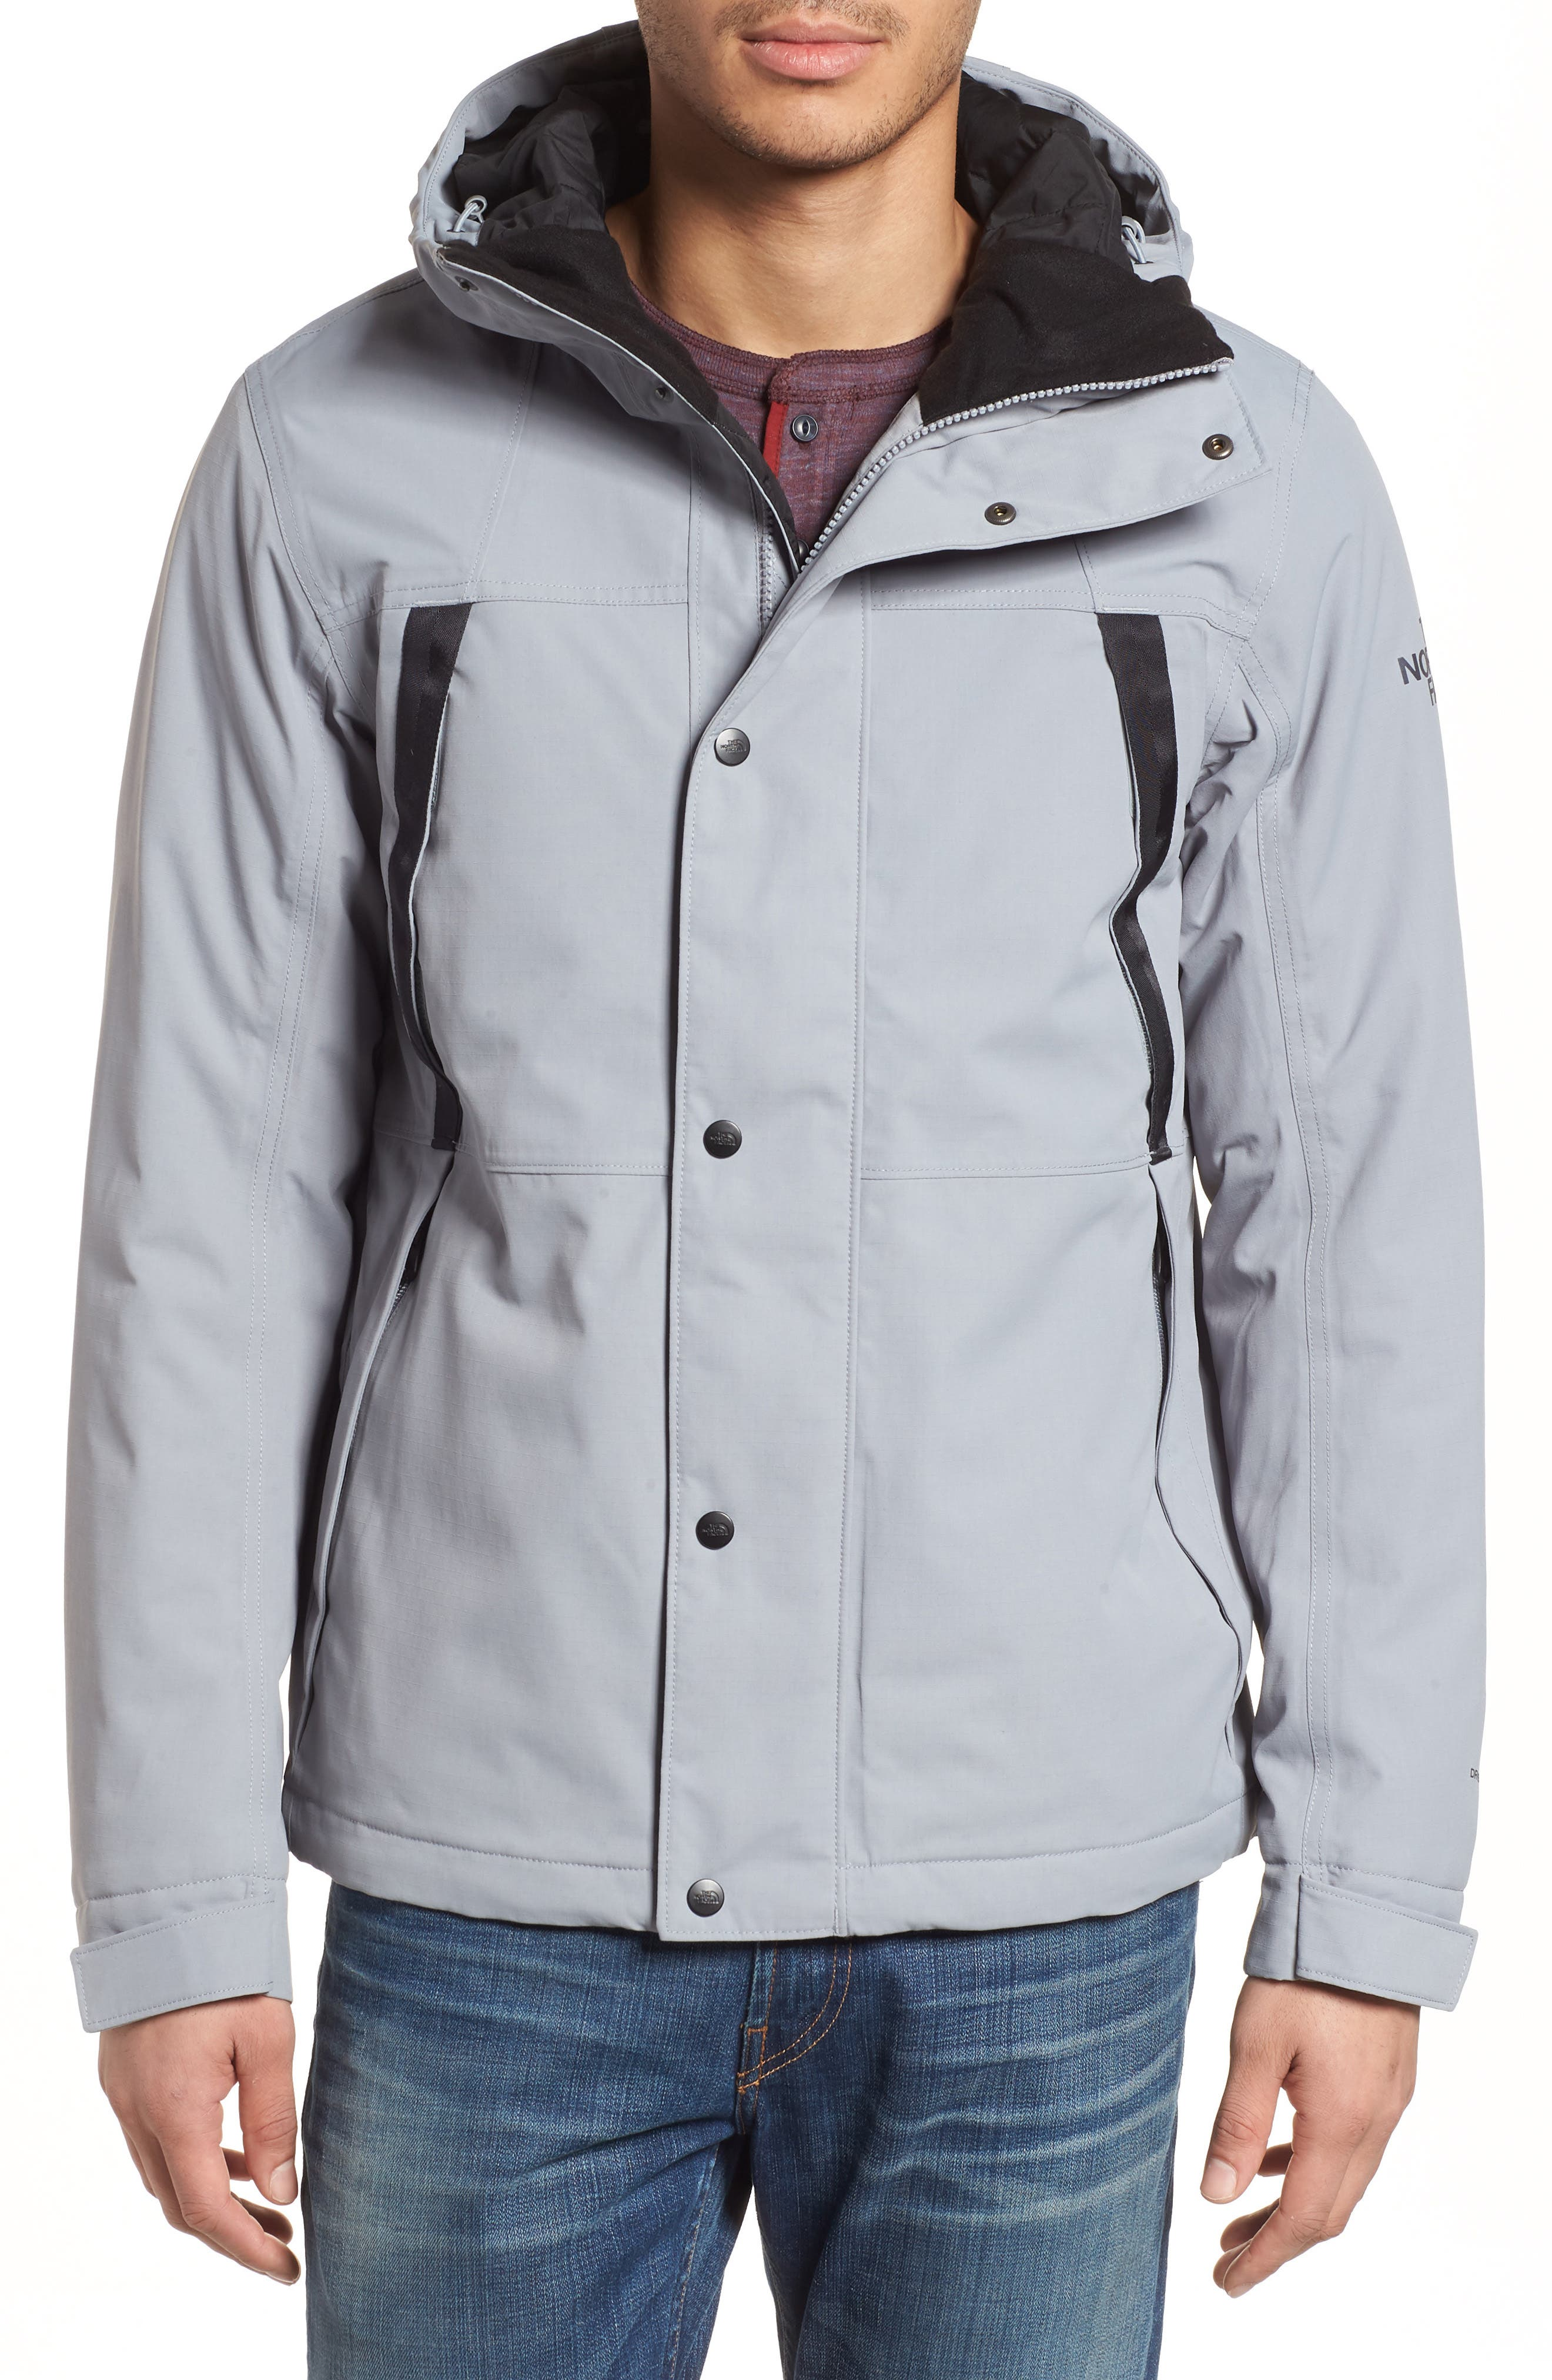 Stetler Insulated Rain Jacket,                             Alternate thumbnail 4, color,                             MID GREY